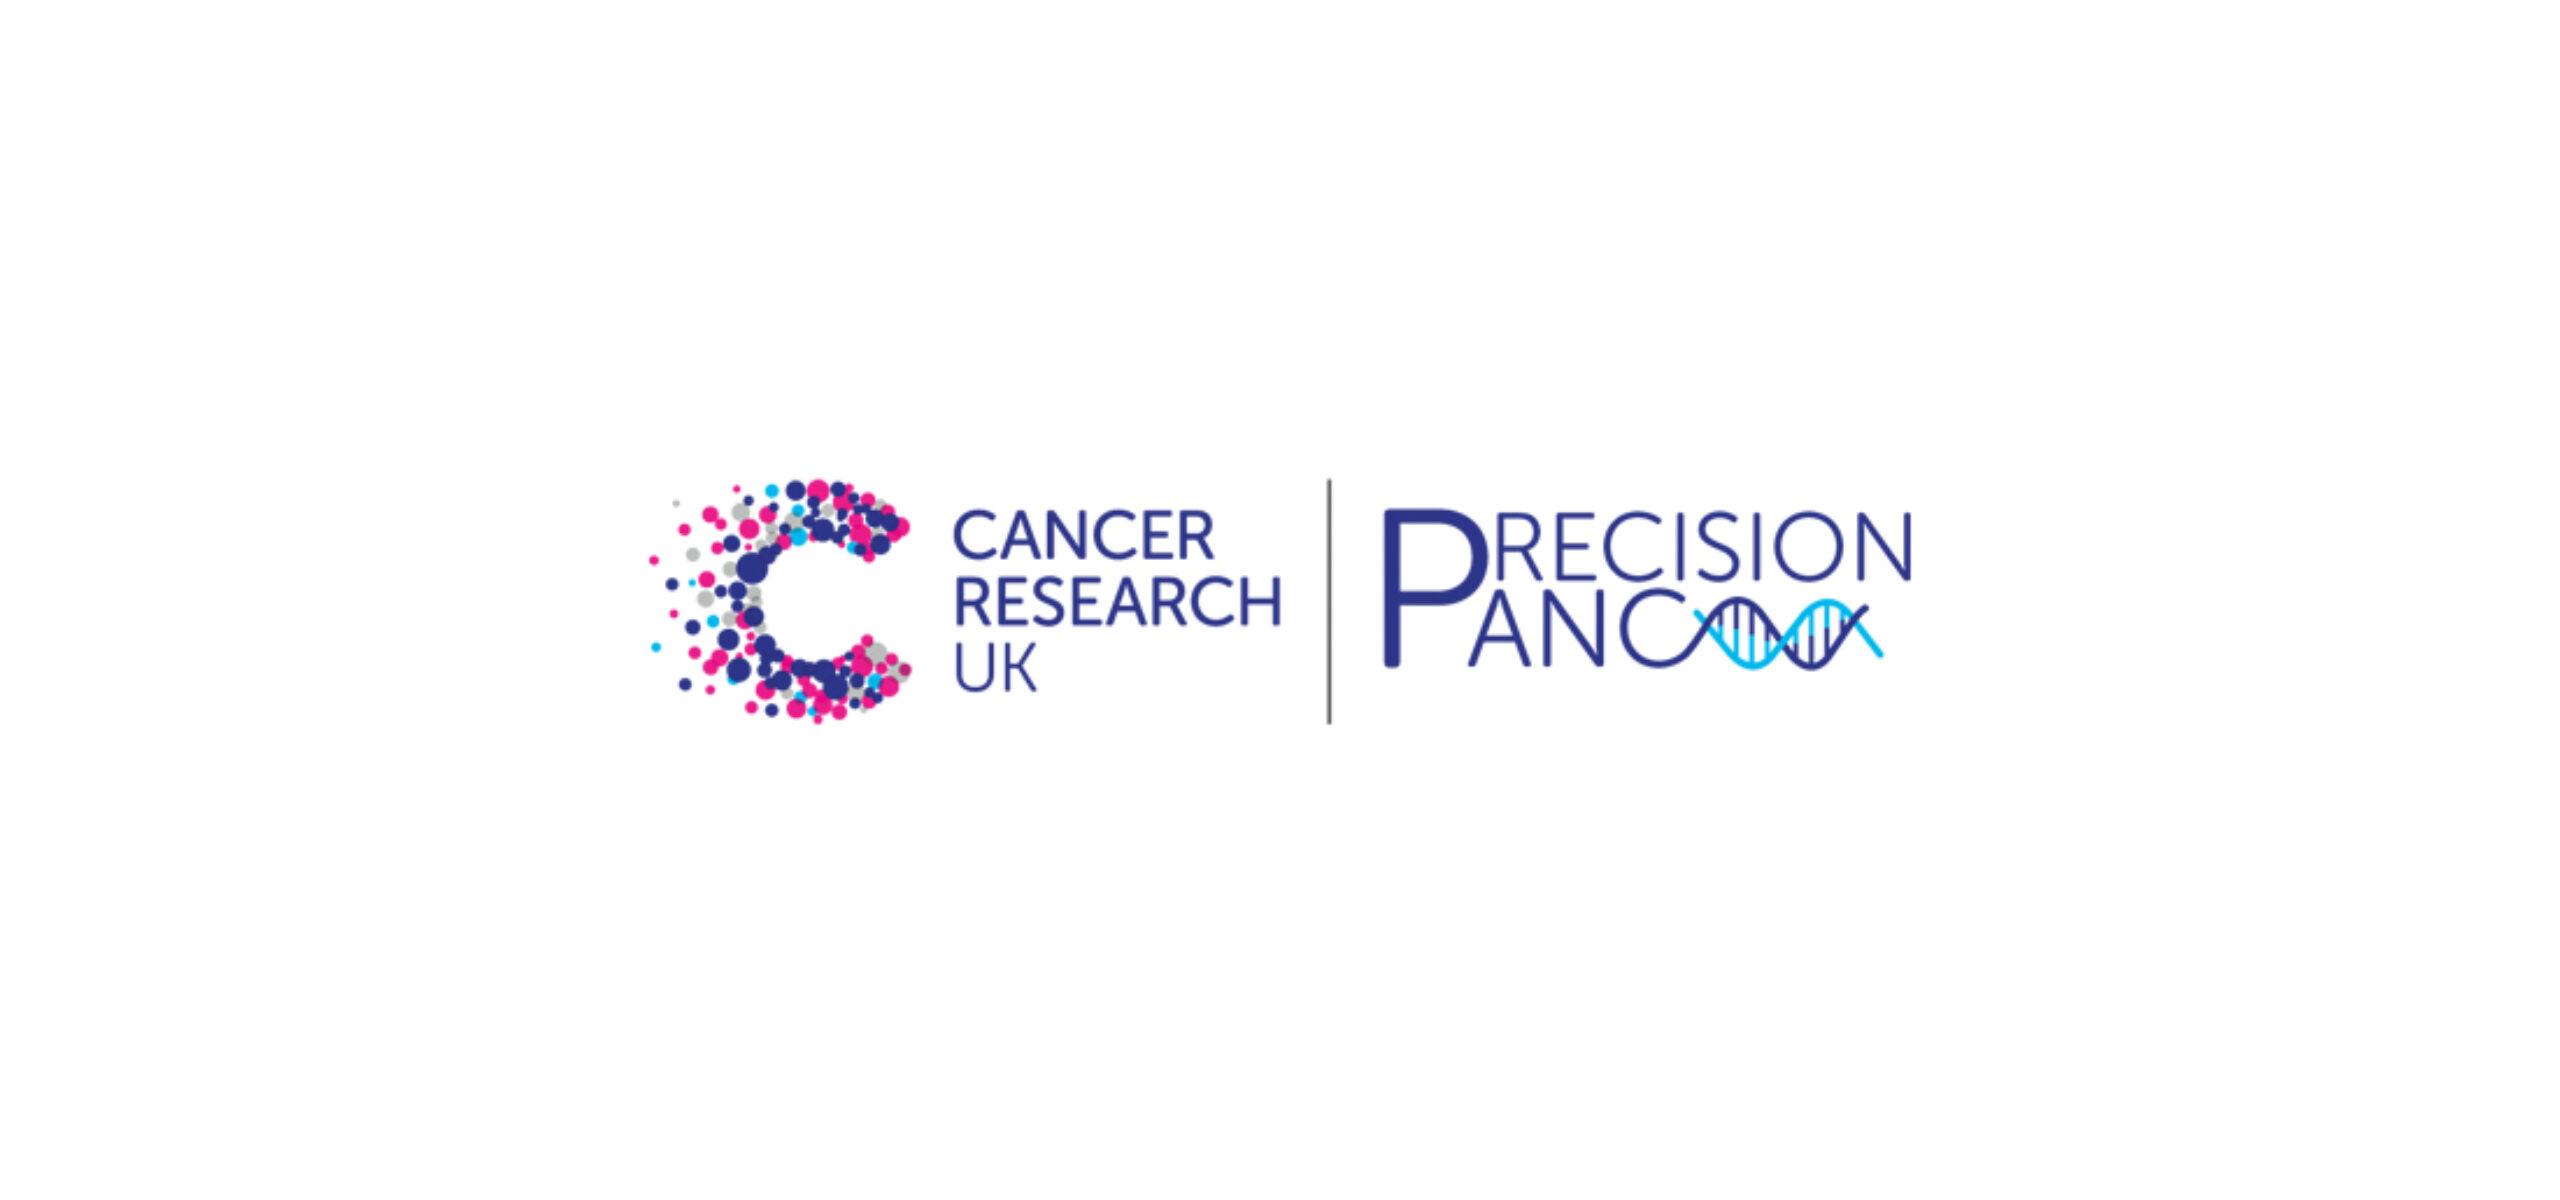 Cancer Research UK Precision Panc logo